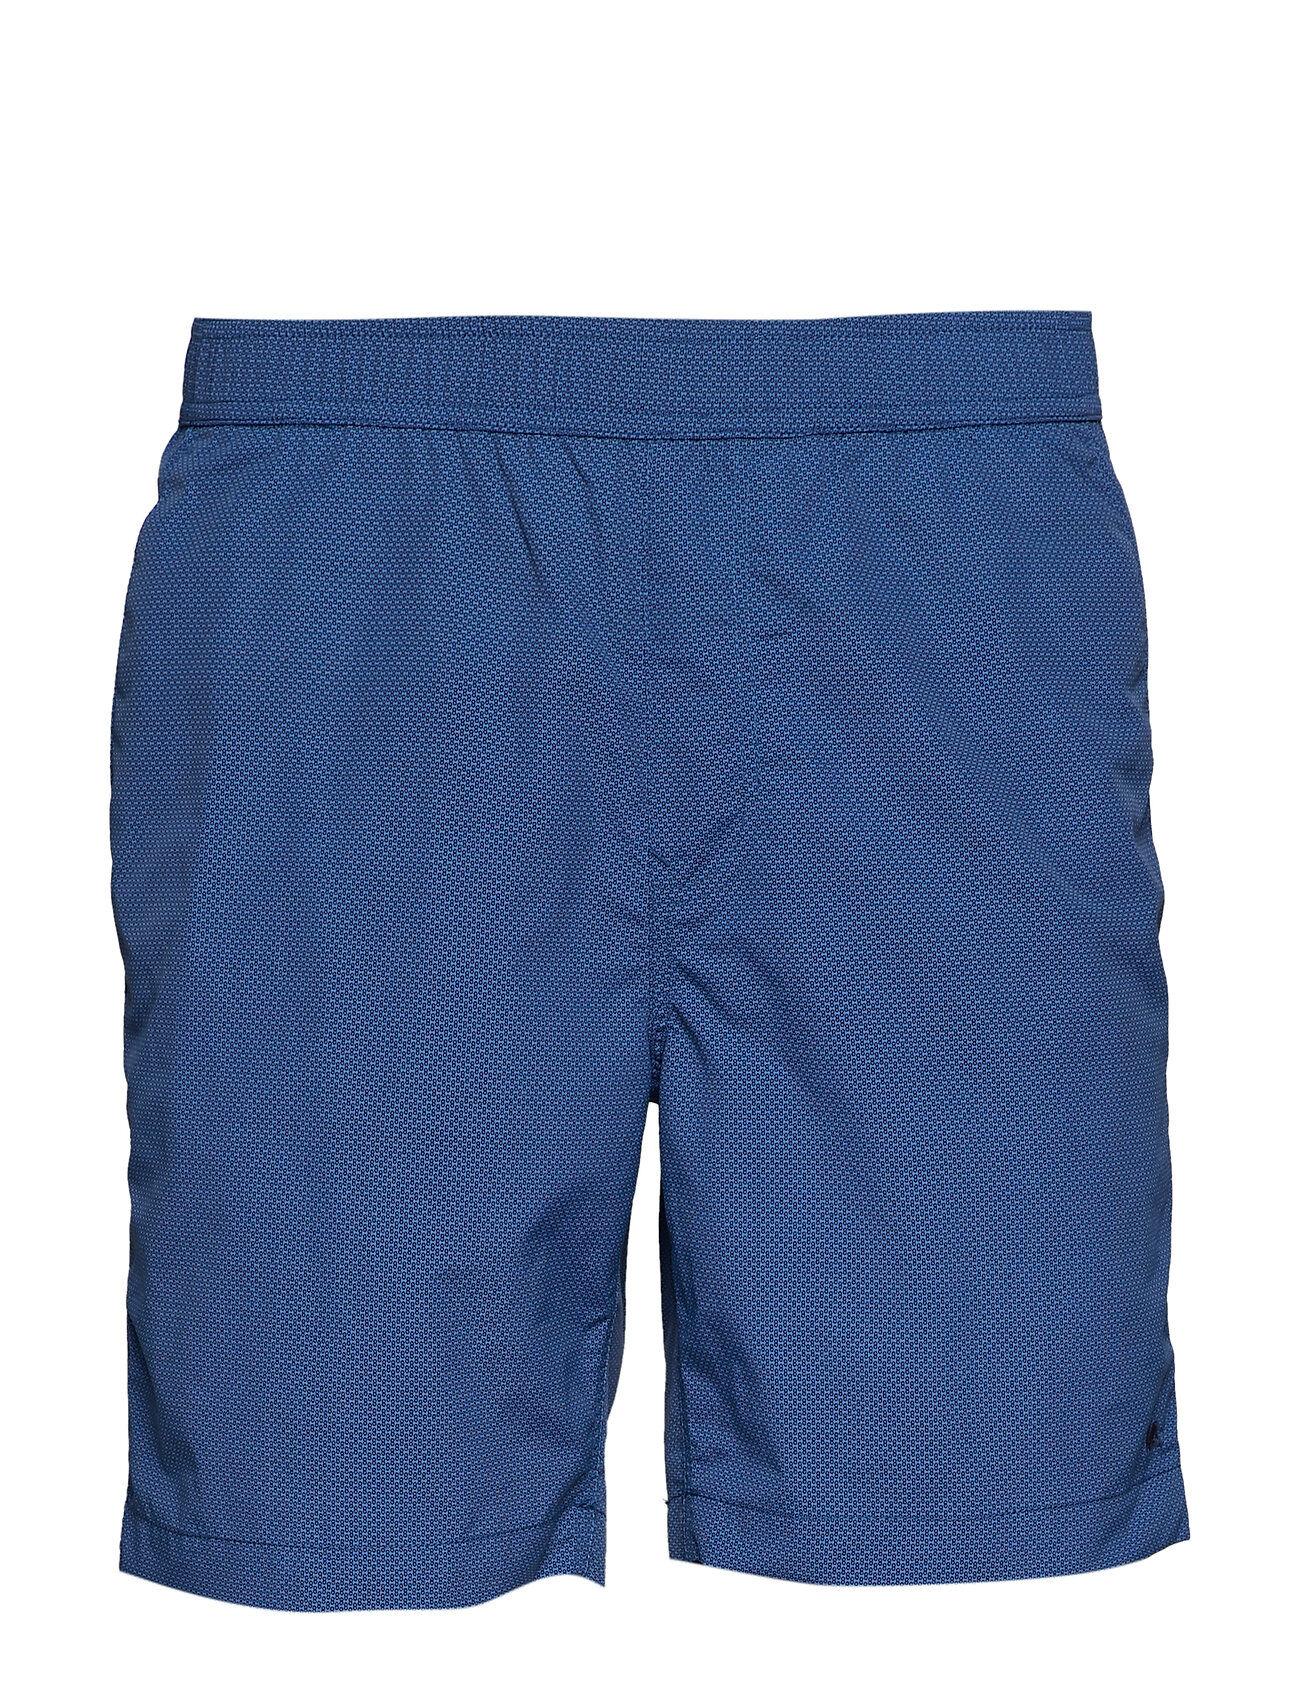 Lindbergh Casual Swim Shorts